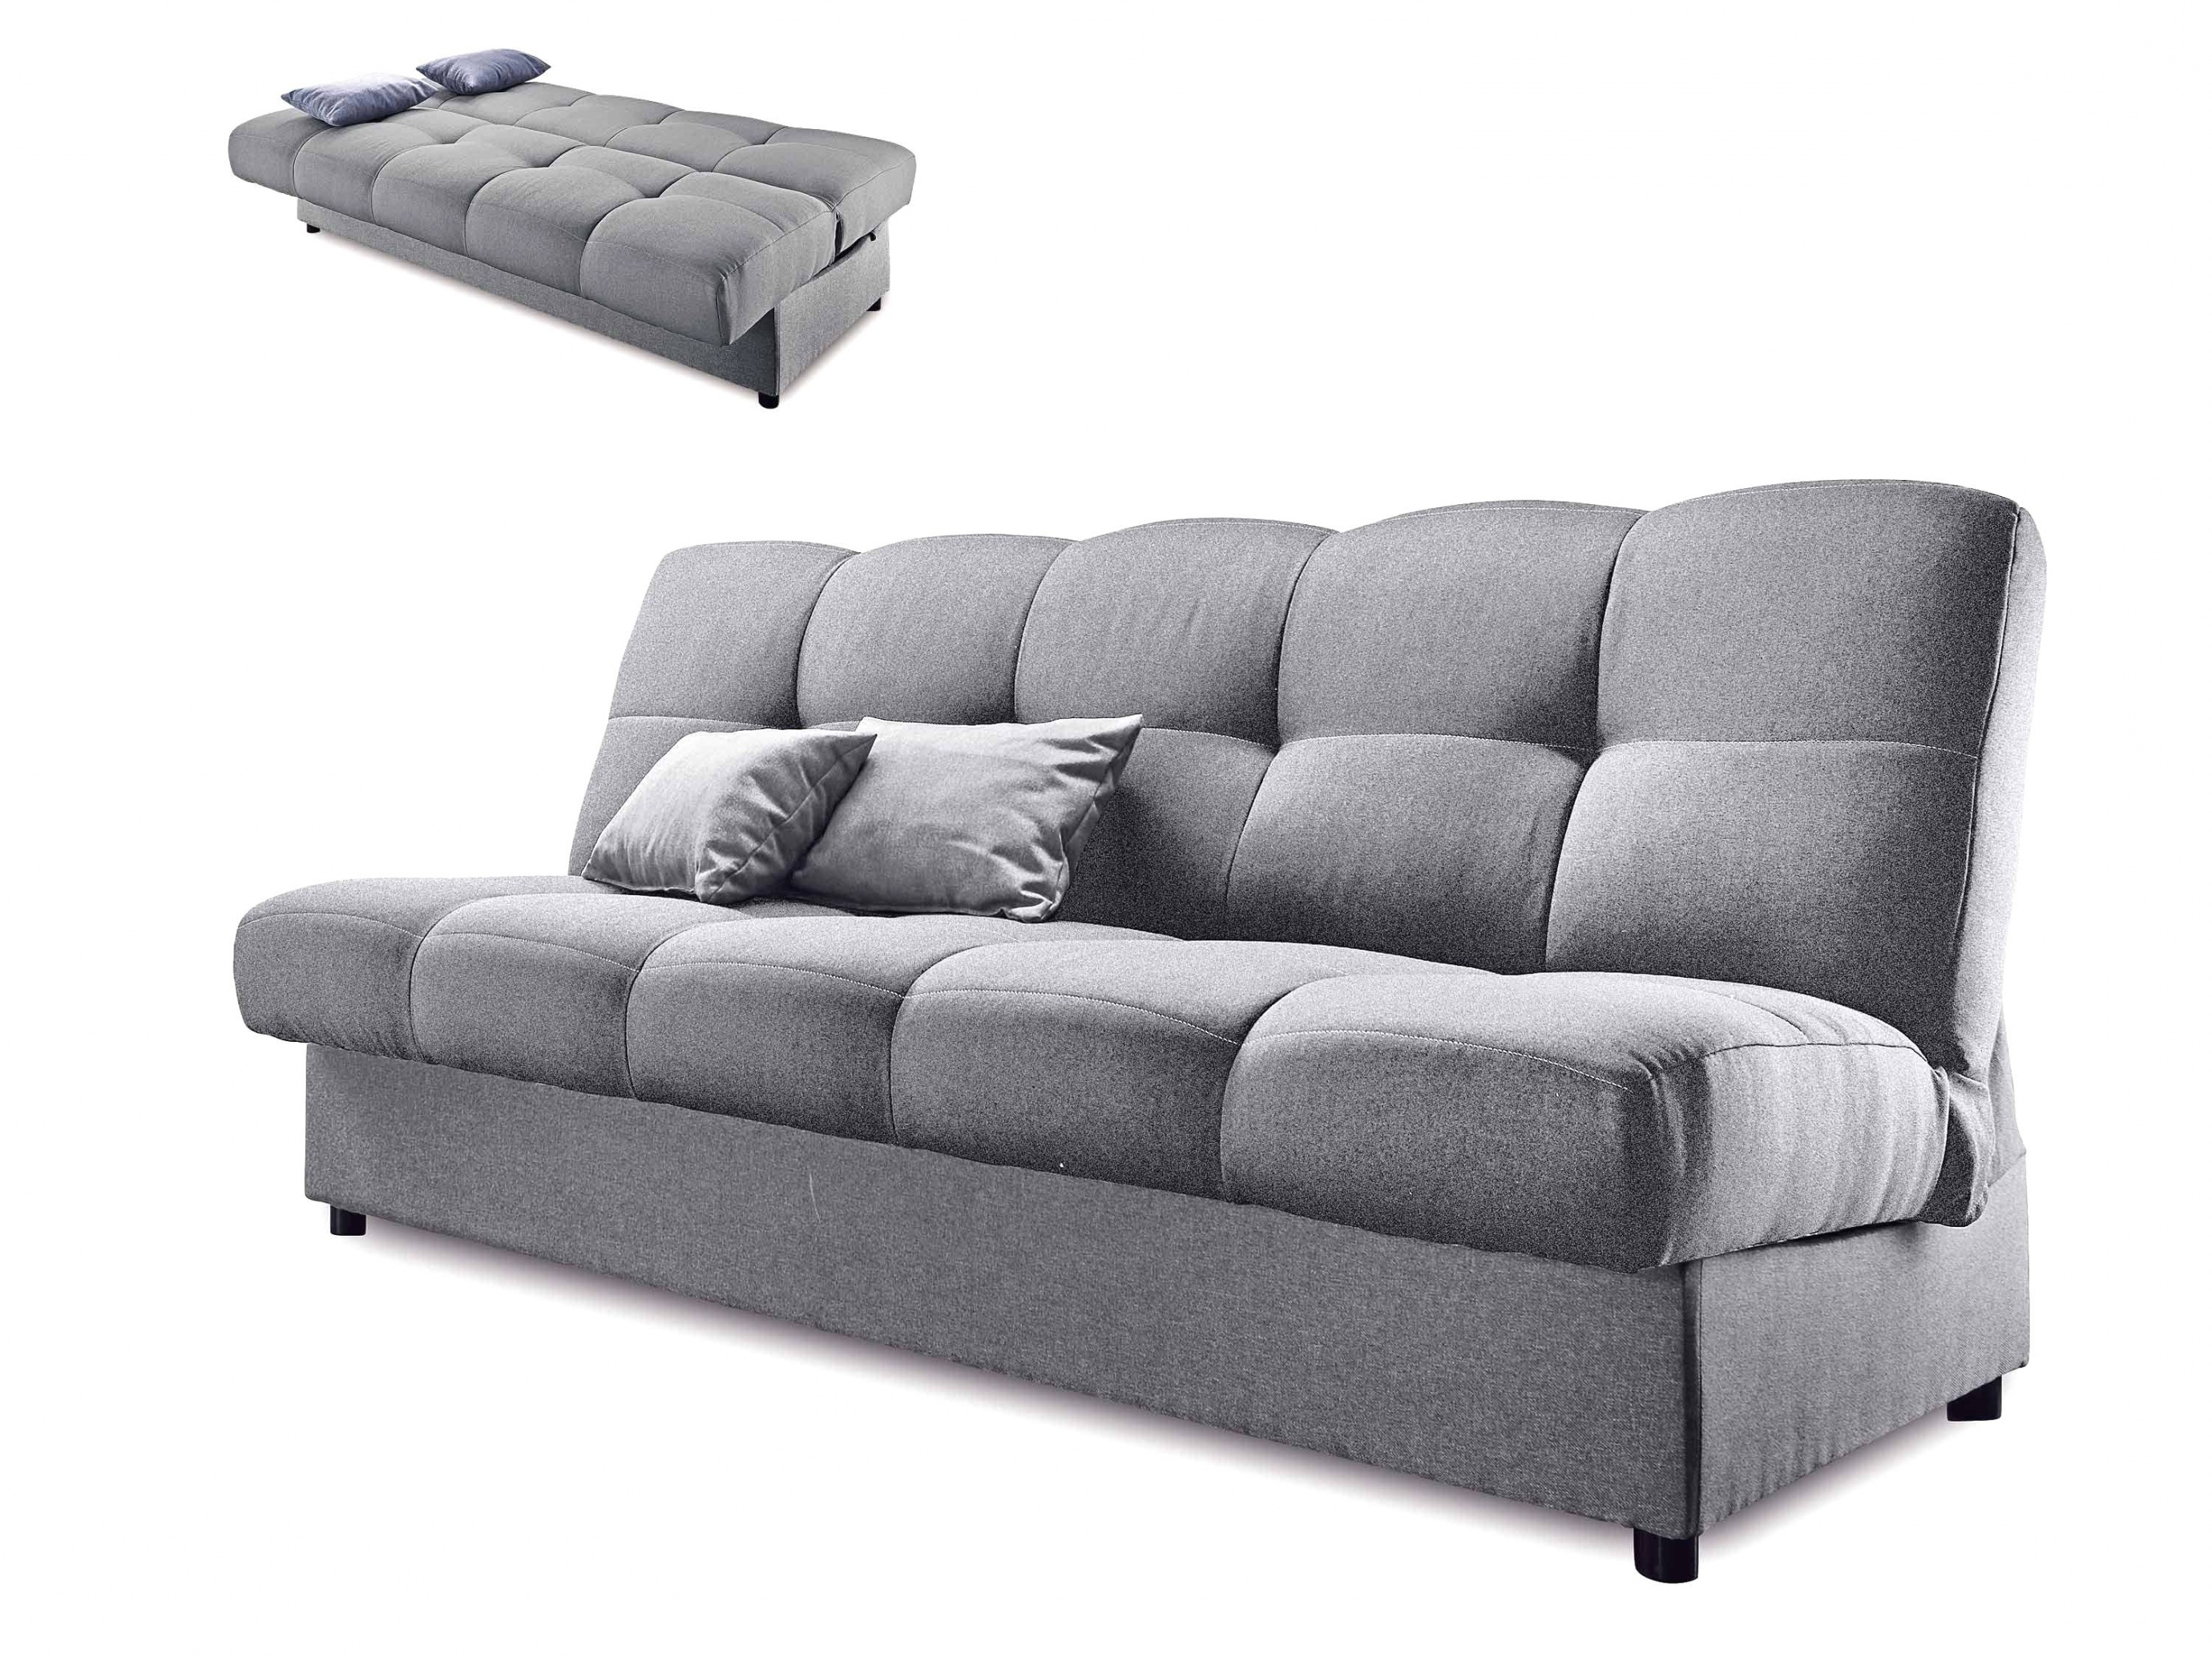 Sofa Cama Italiano Ikea H9d9 sofa Cama Italiano Ikea Stunning Enchanting sofa Cama Cargando